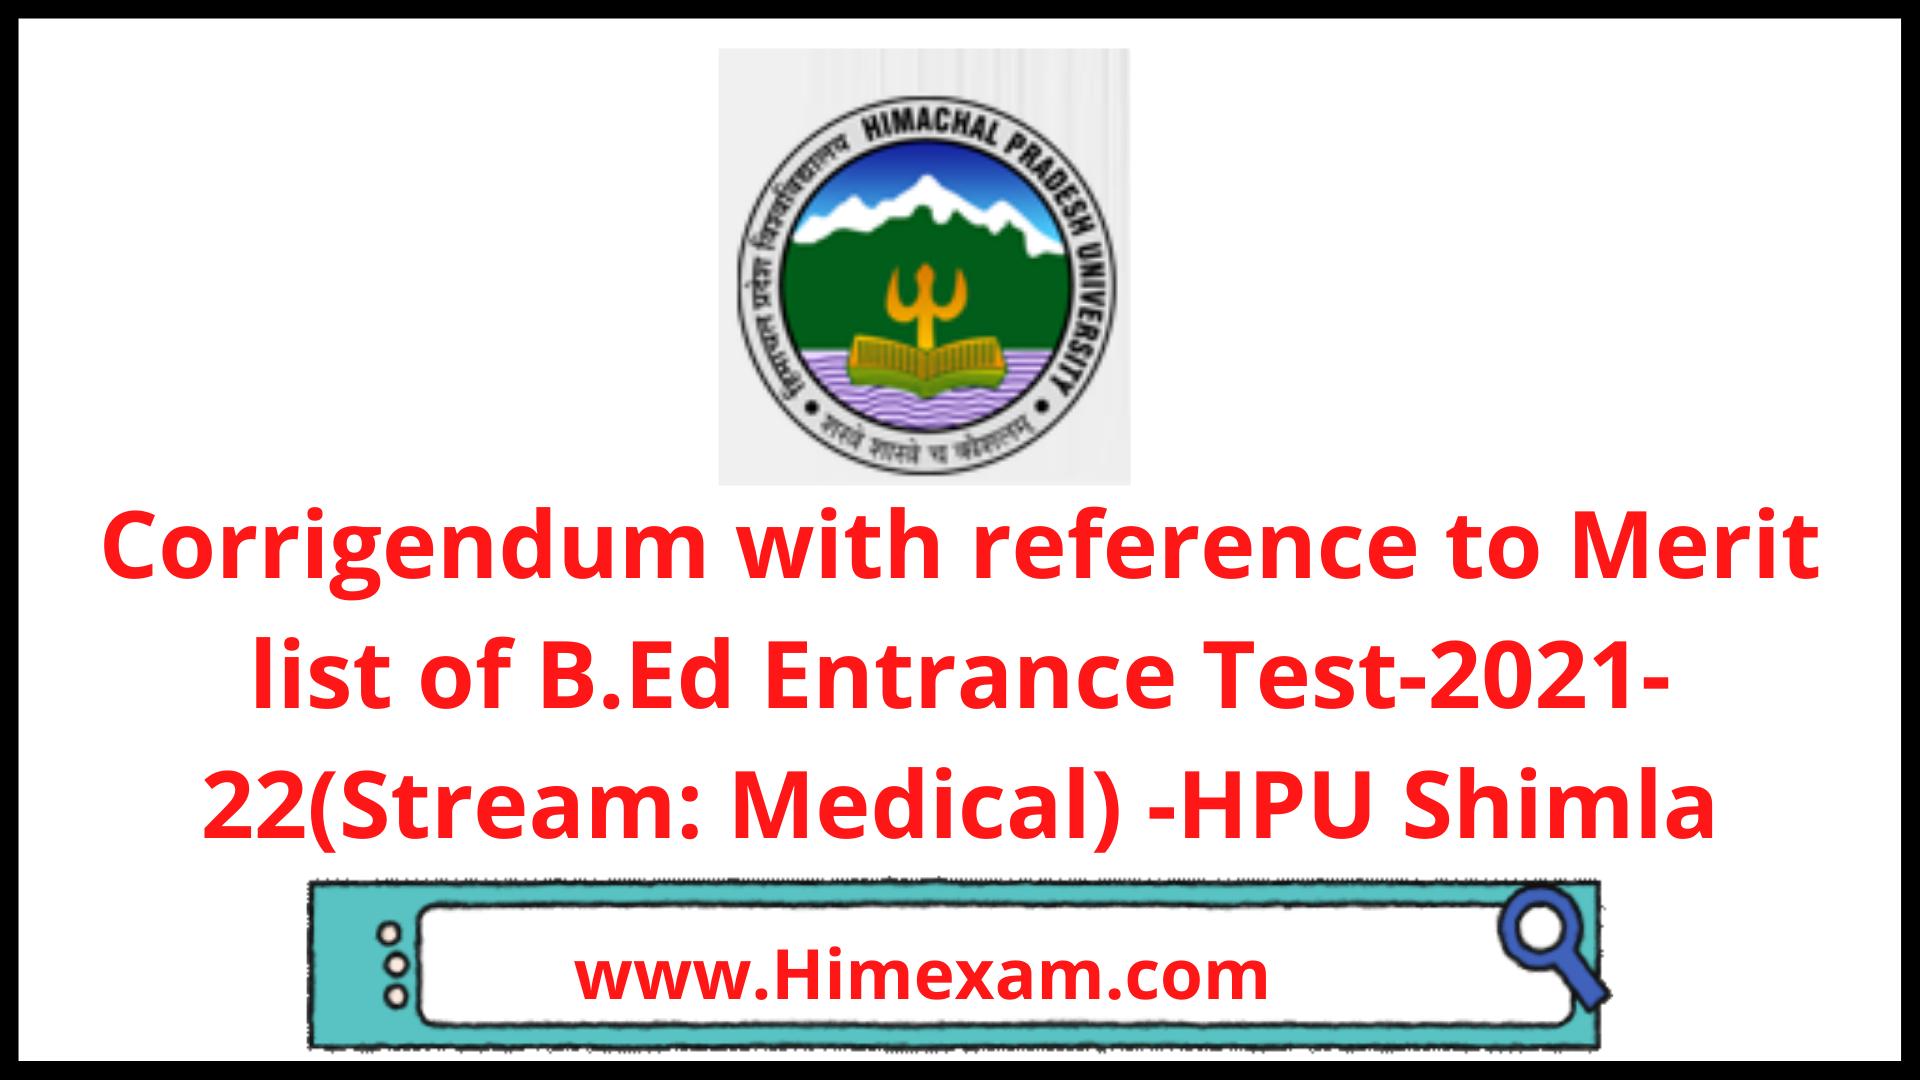 Corrigendum with reference to Merit list of B.Ed Entrance Test-2021-22(Stream: Medical) -HPU Shimla